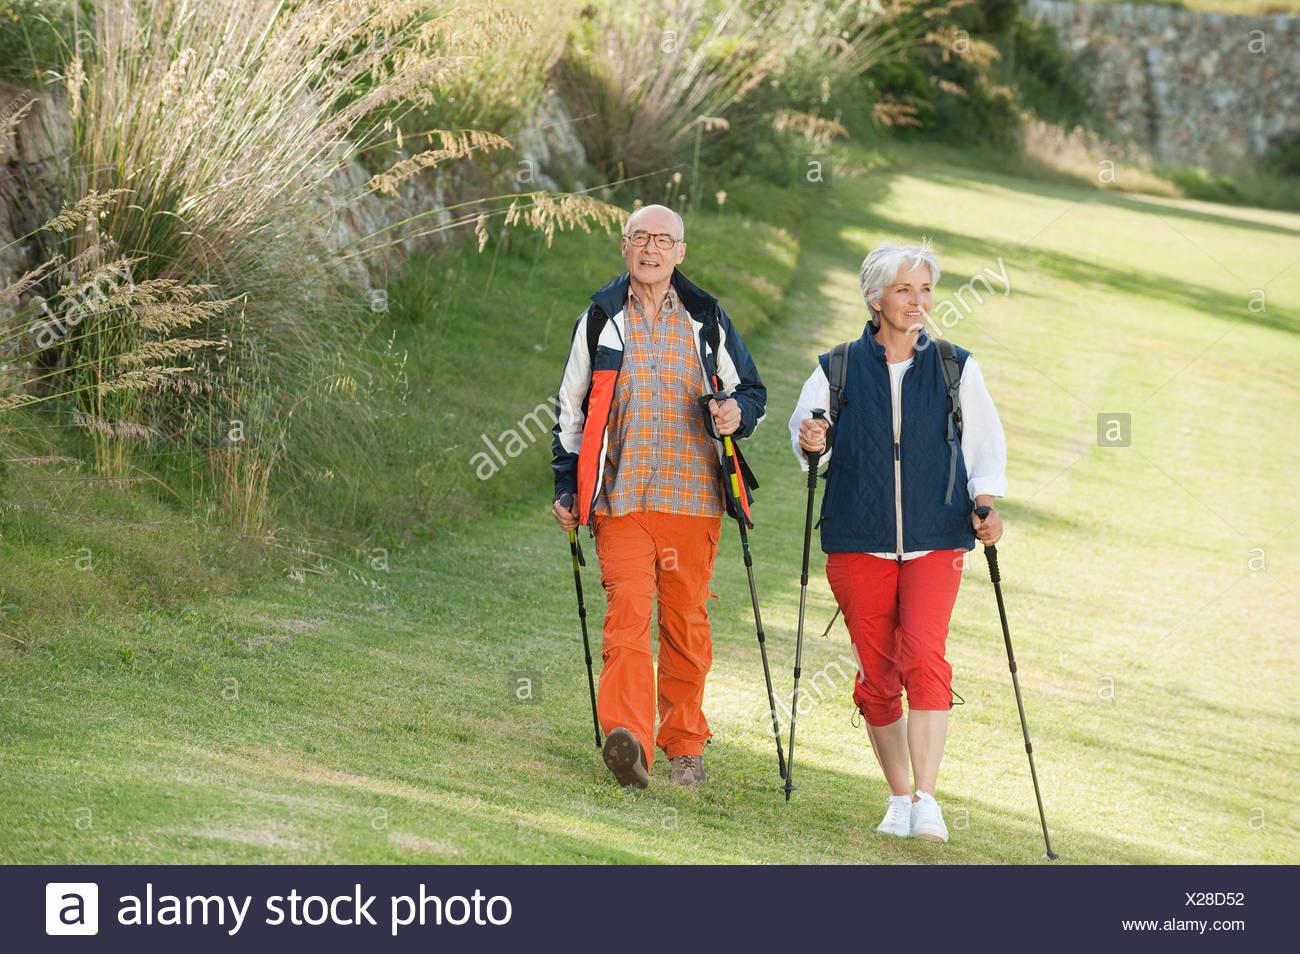 Spain, Mallorca, Senior couple nordic walking - Stock Image